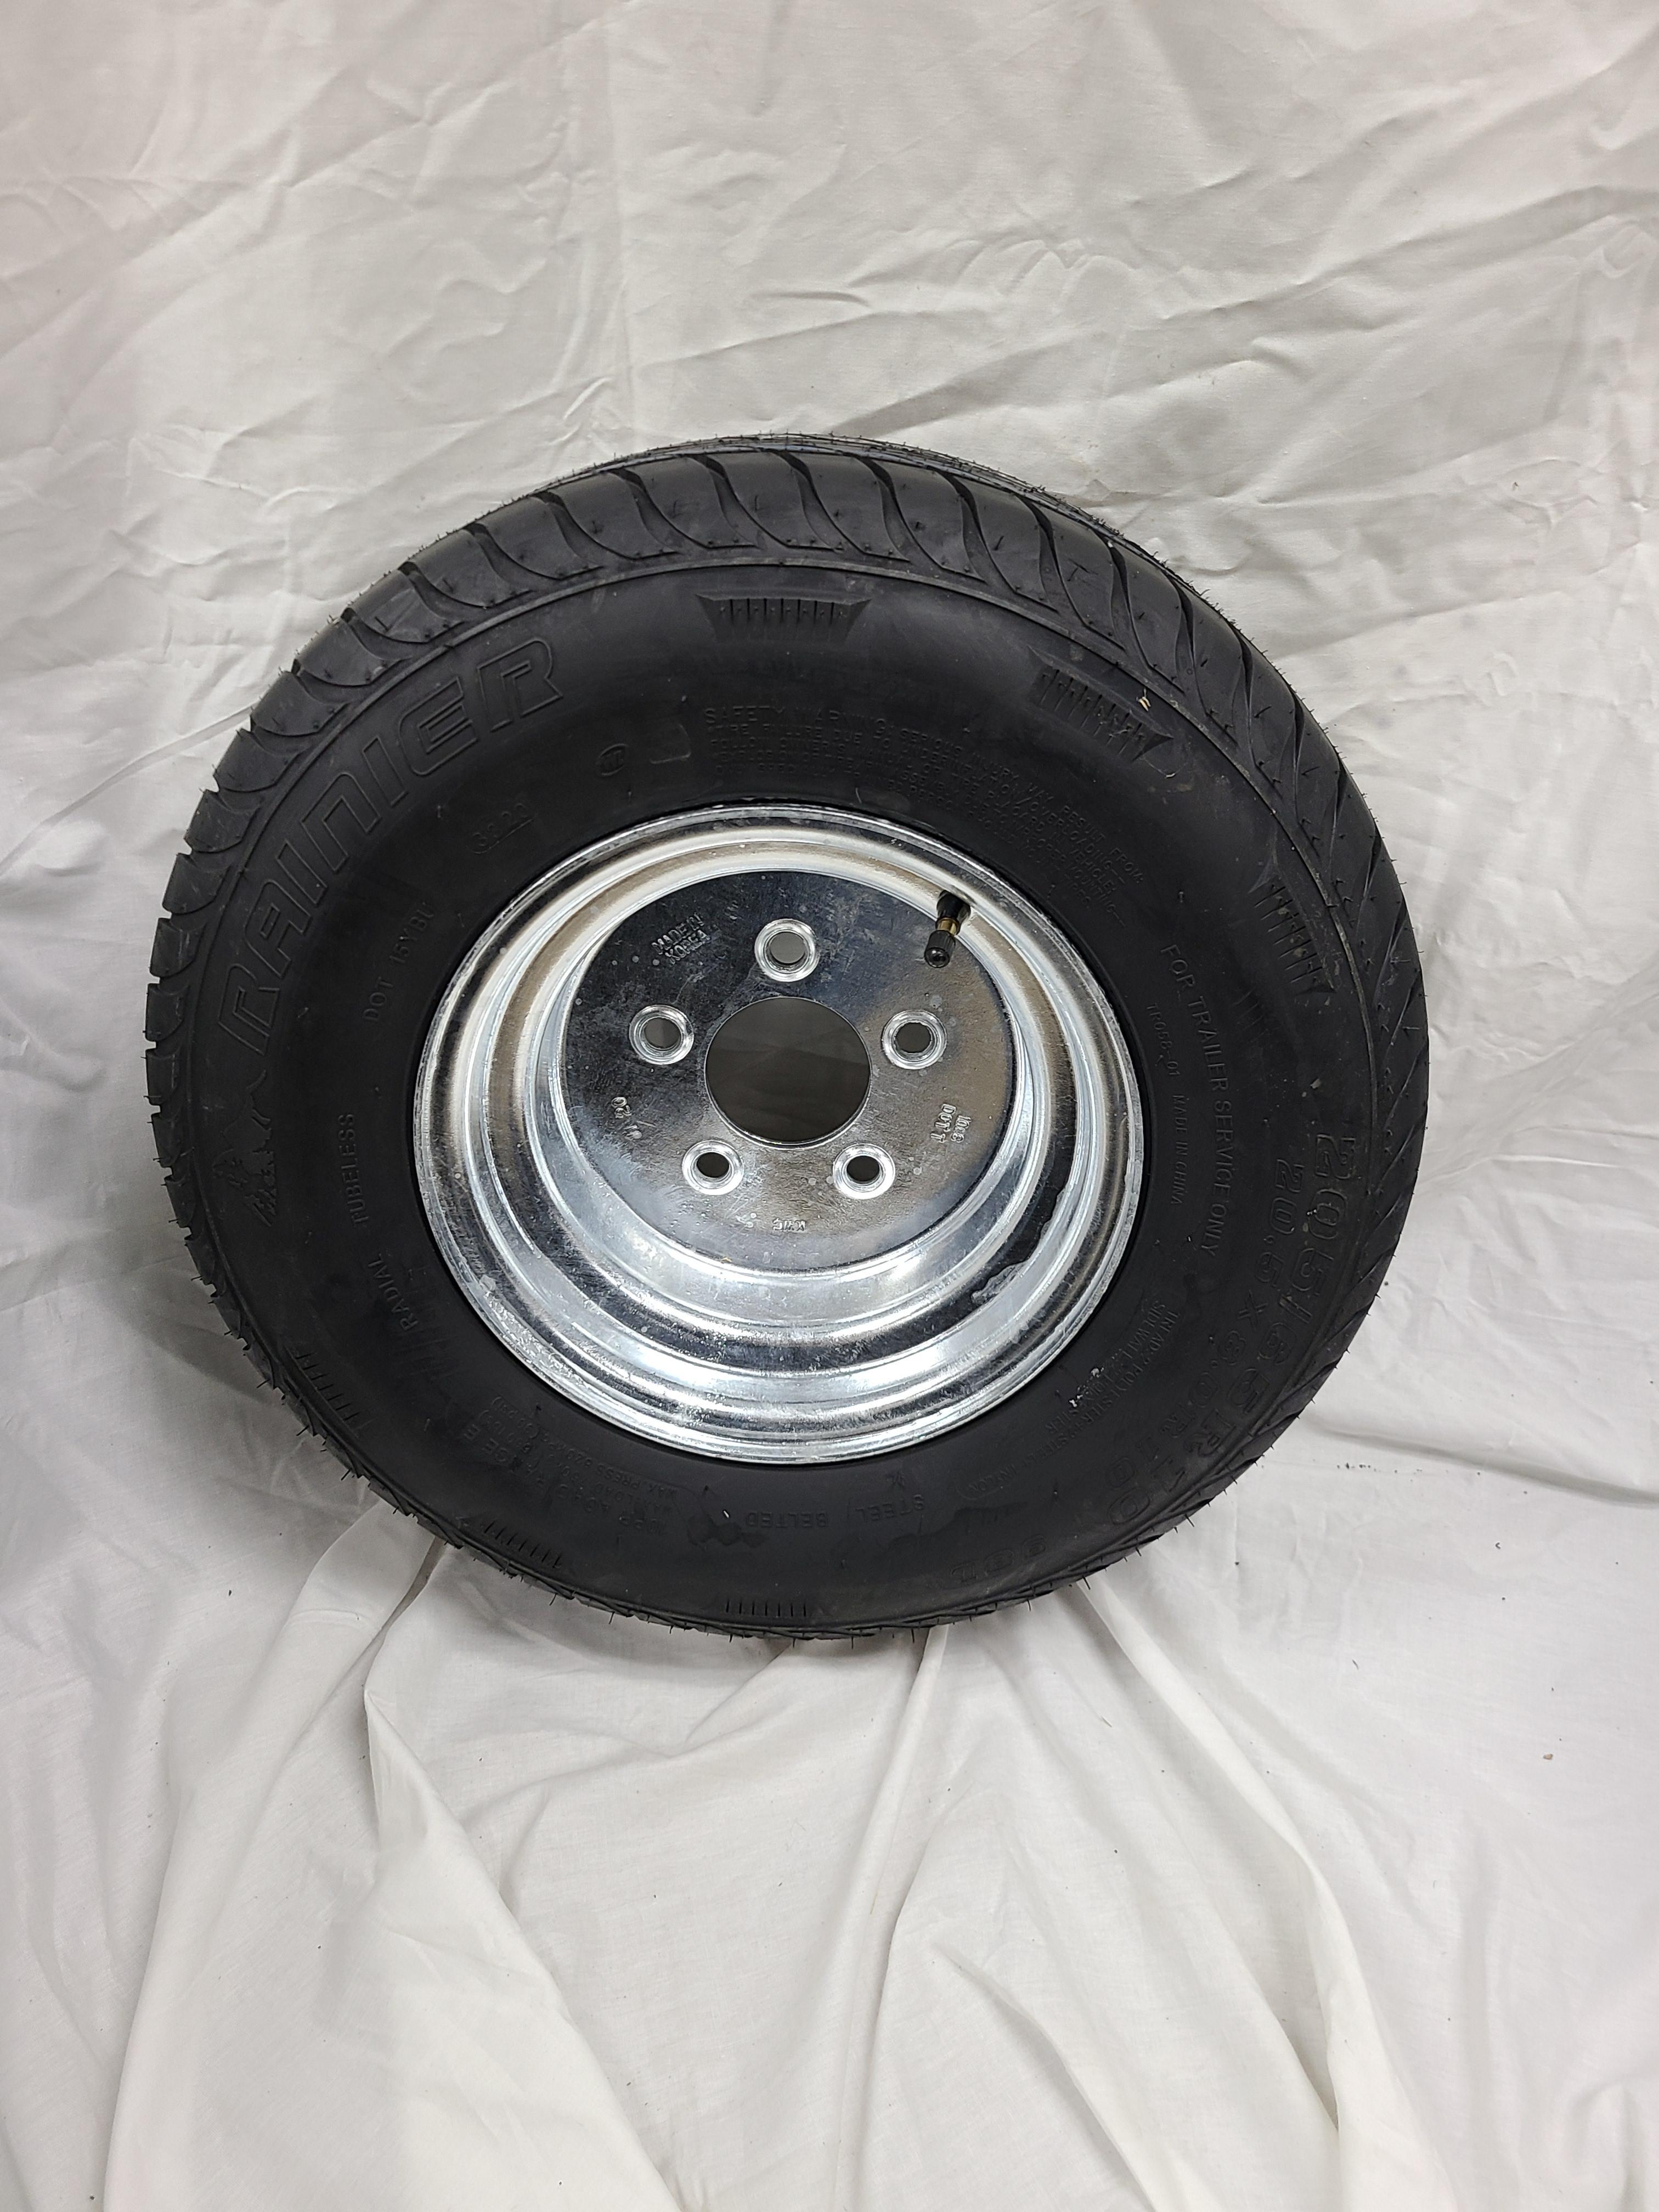 20.5X8.0X10 Load Range E Tire 5 Lug Galvanized